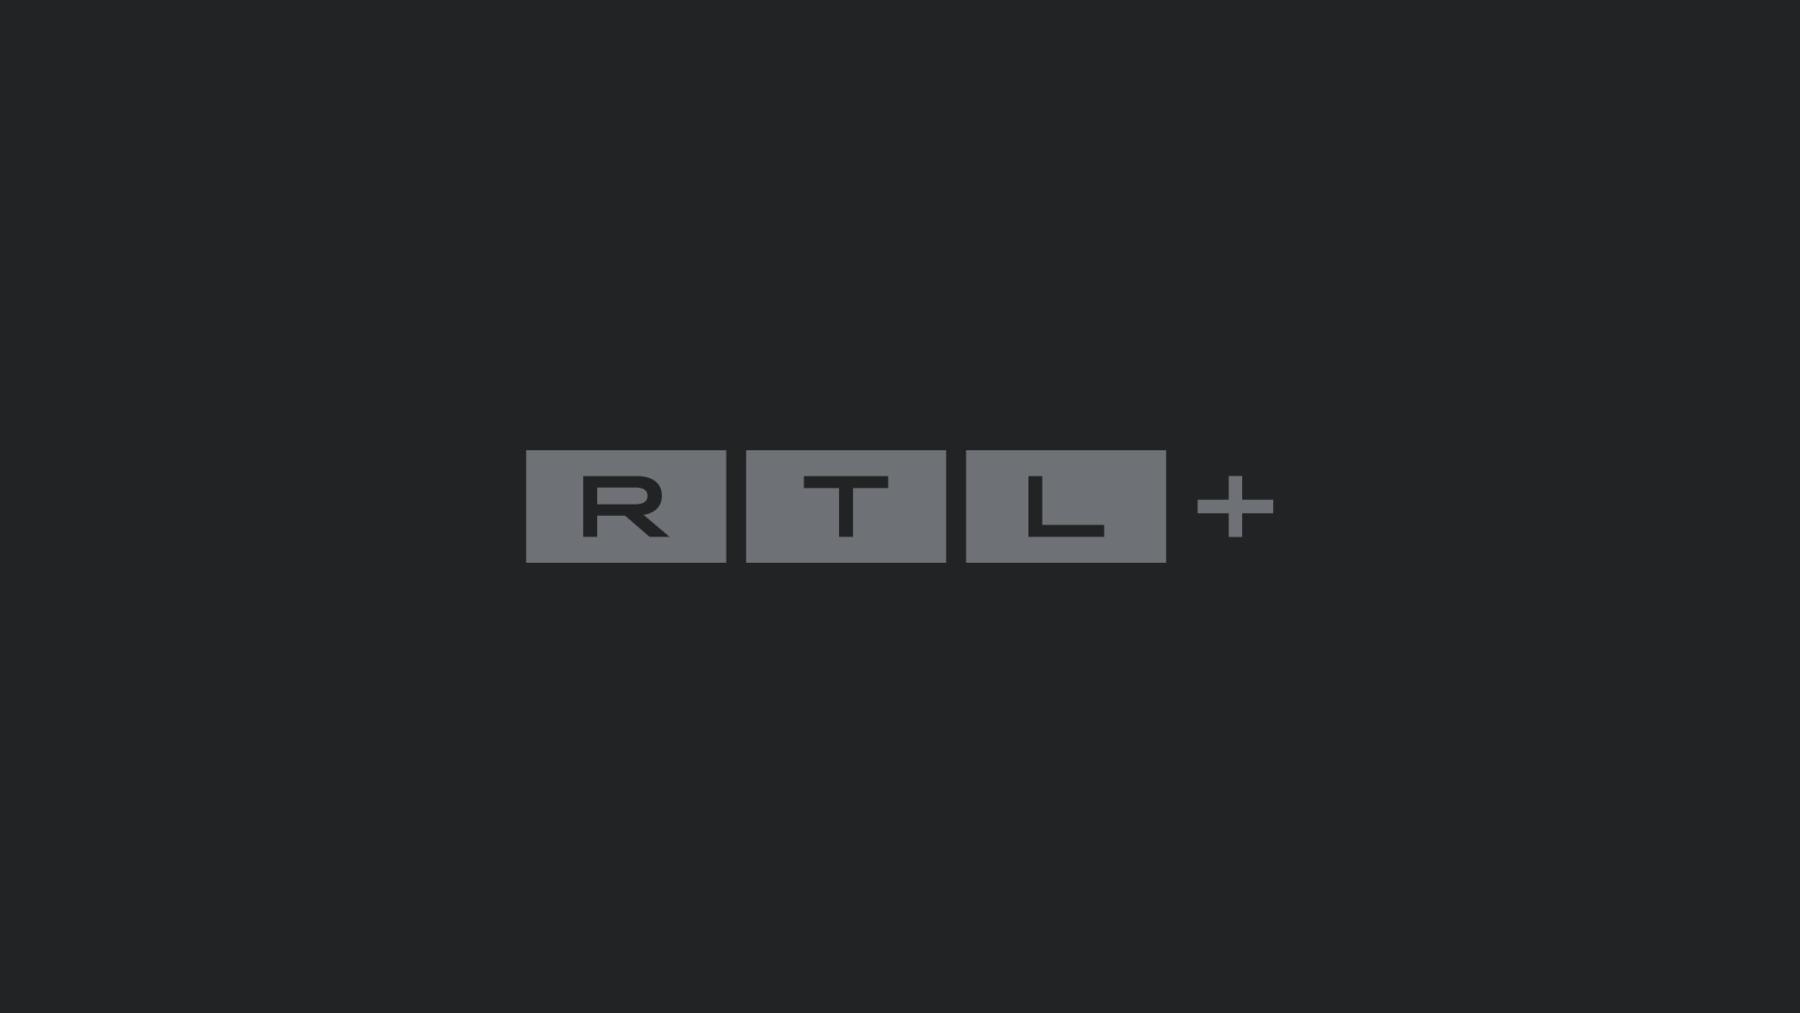 Thema u.a.: Renée Zellweger